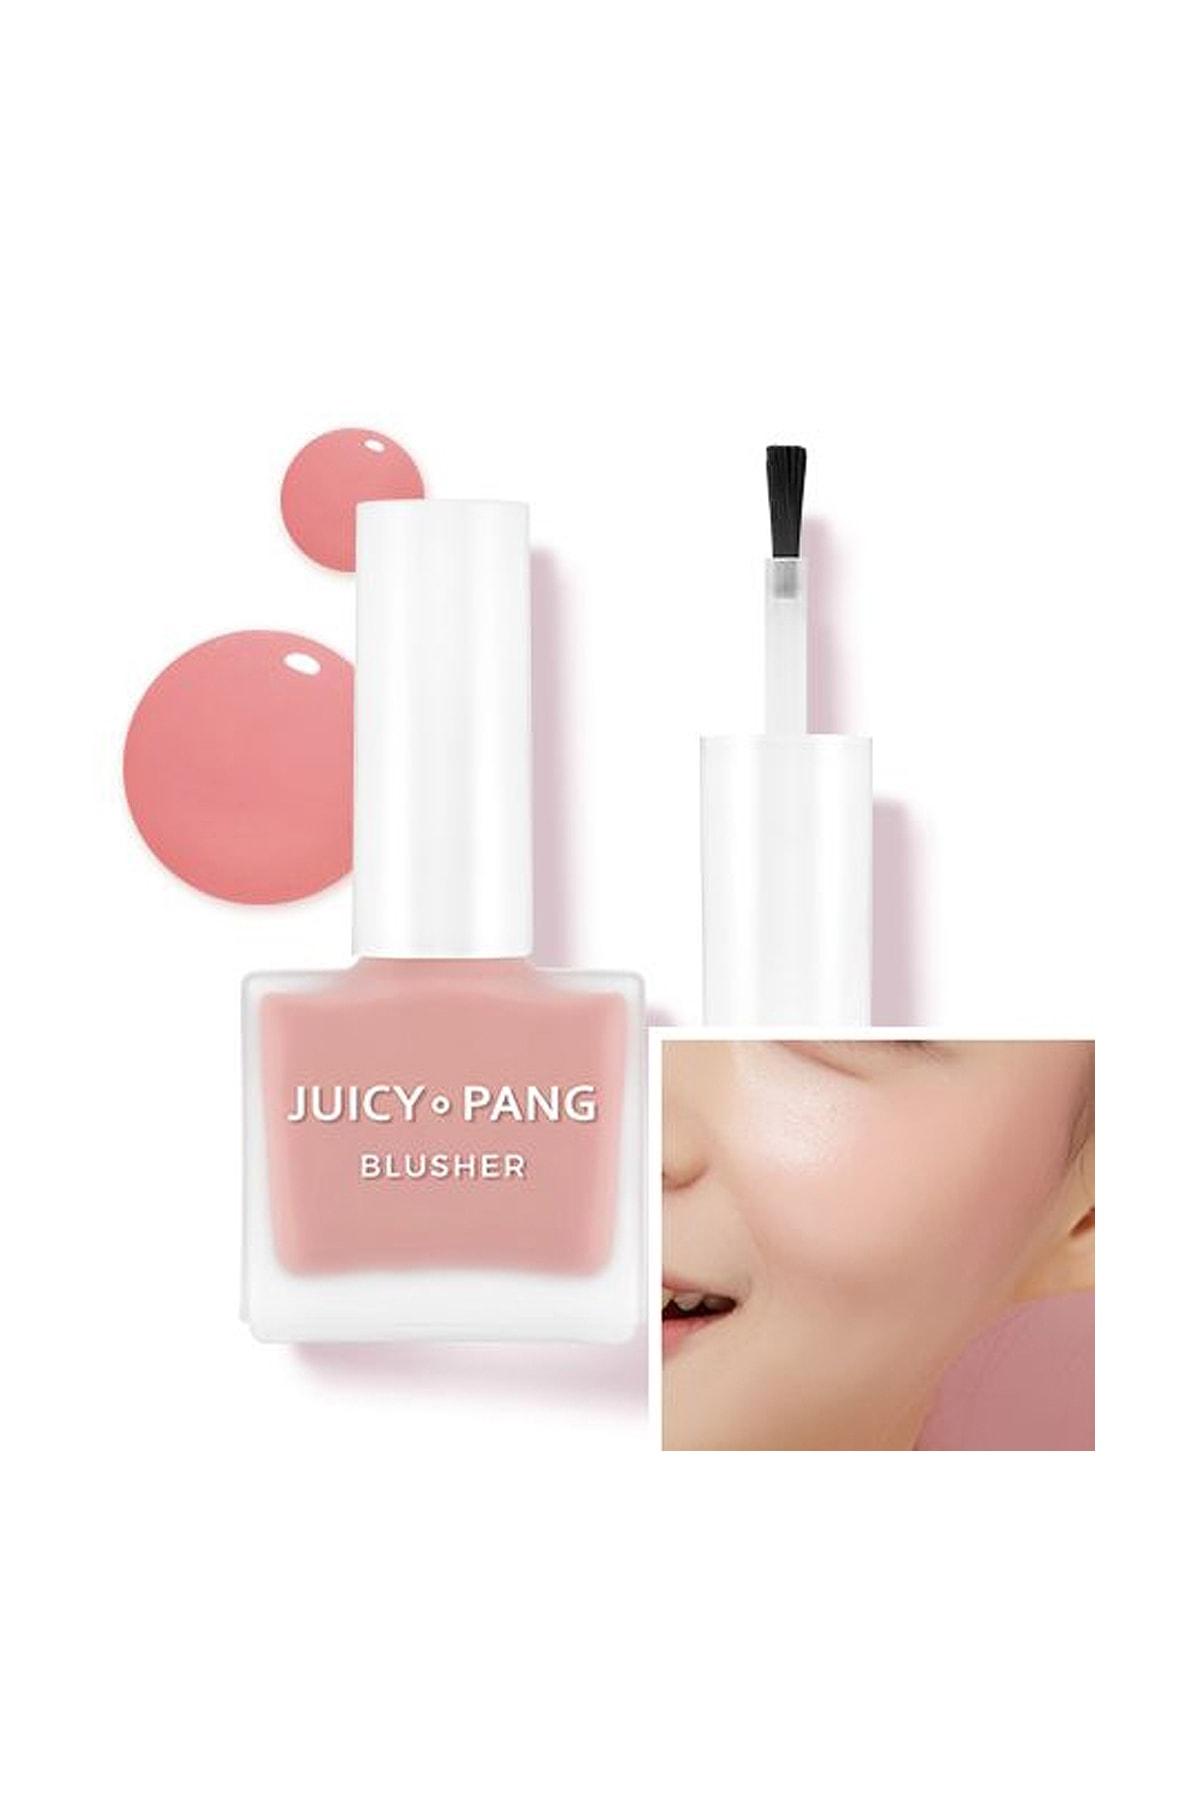 Missha Doğal Görünüm Sunan Nemlendirici Likit Allık 9g. APIEU Juicy-Pang Water Blusher (PK03)